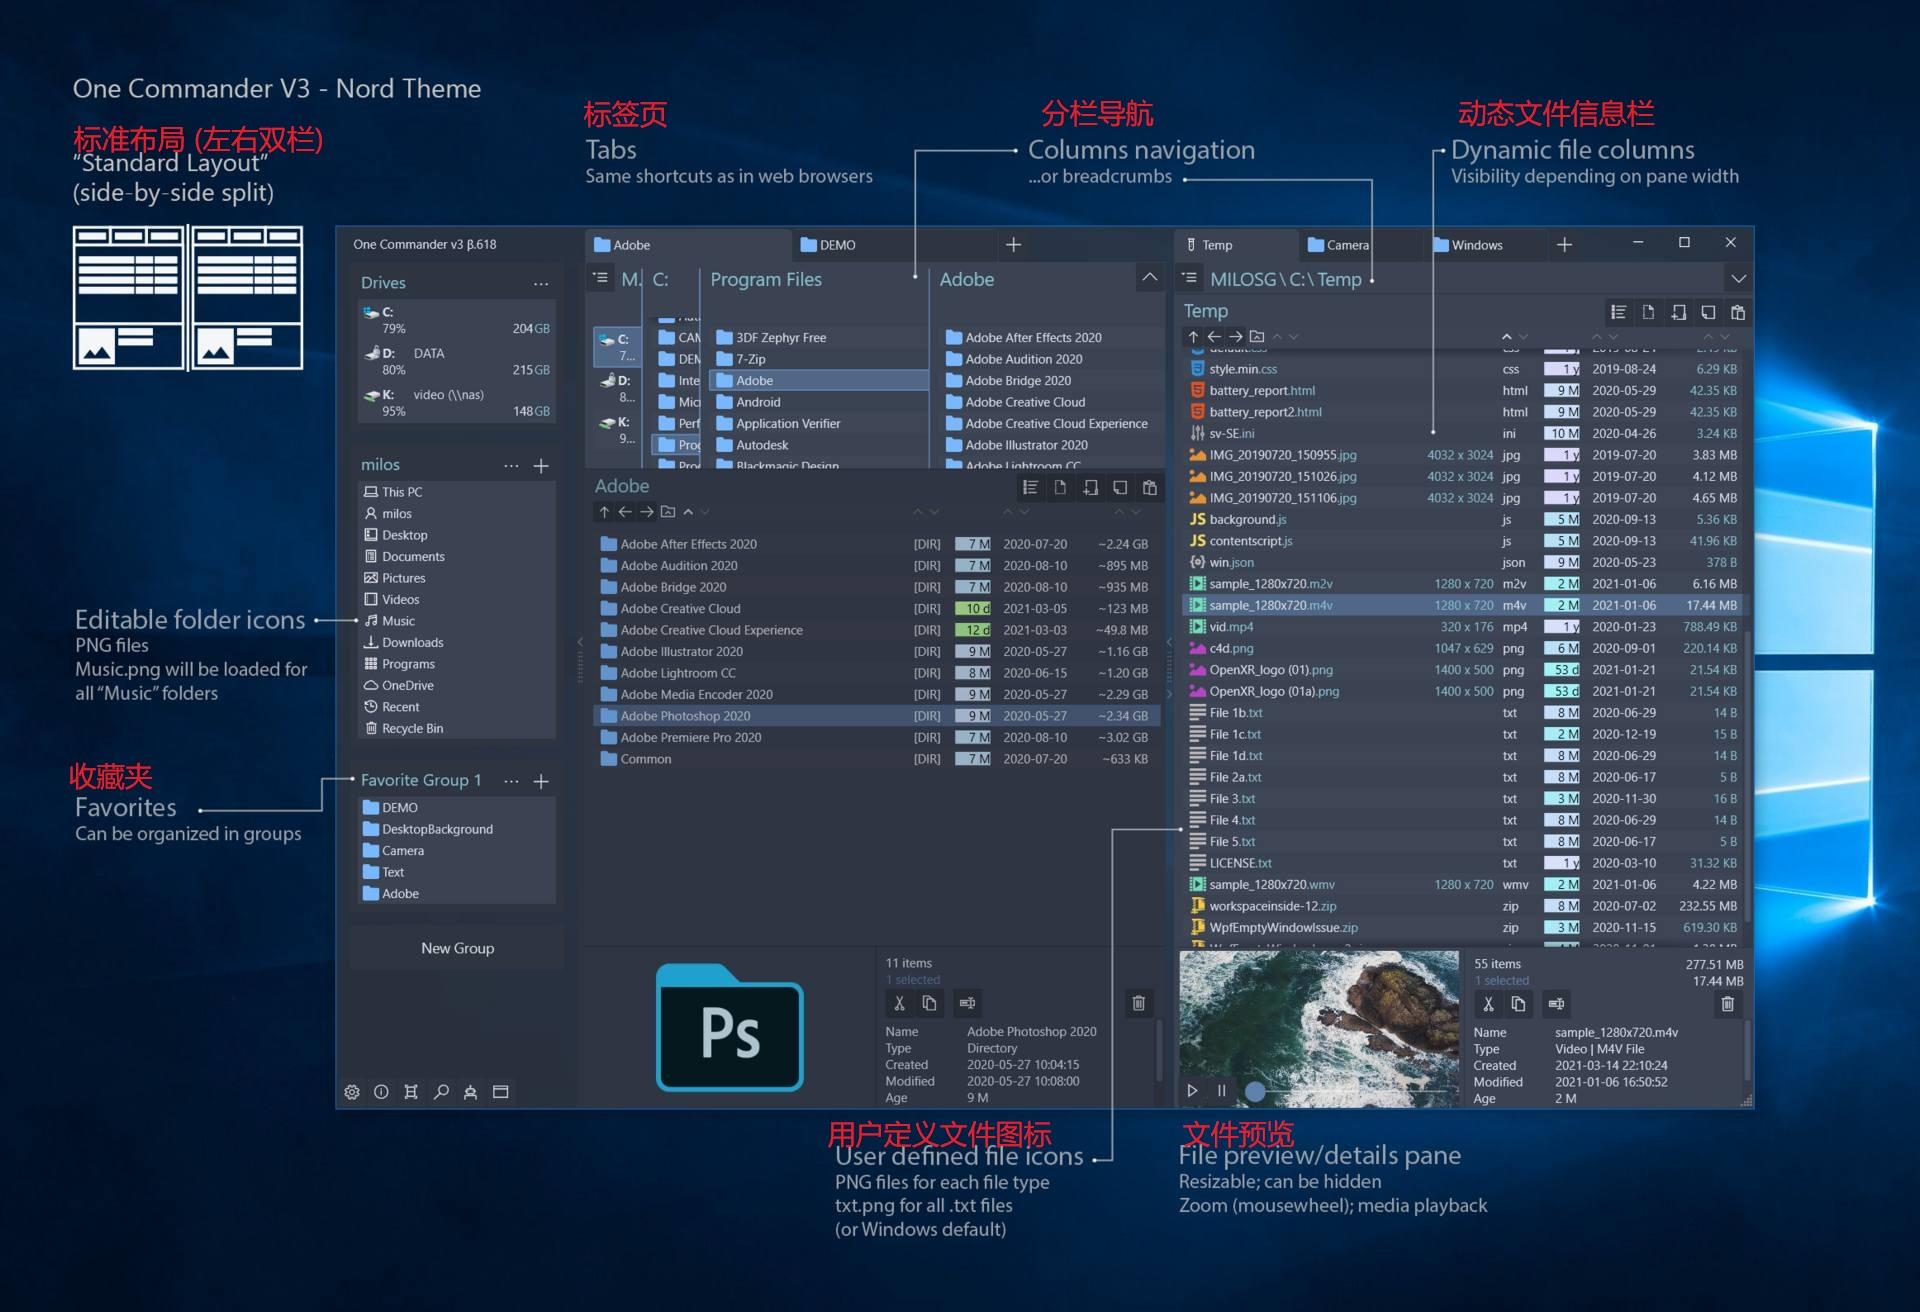 [Windows] 双栏文件管理器 One Commander V3 支持中文了